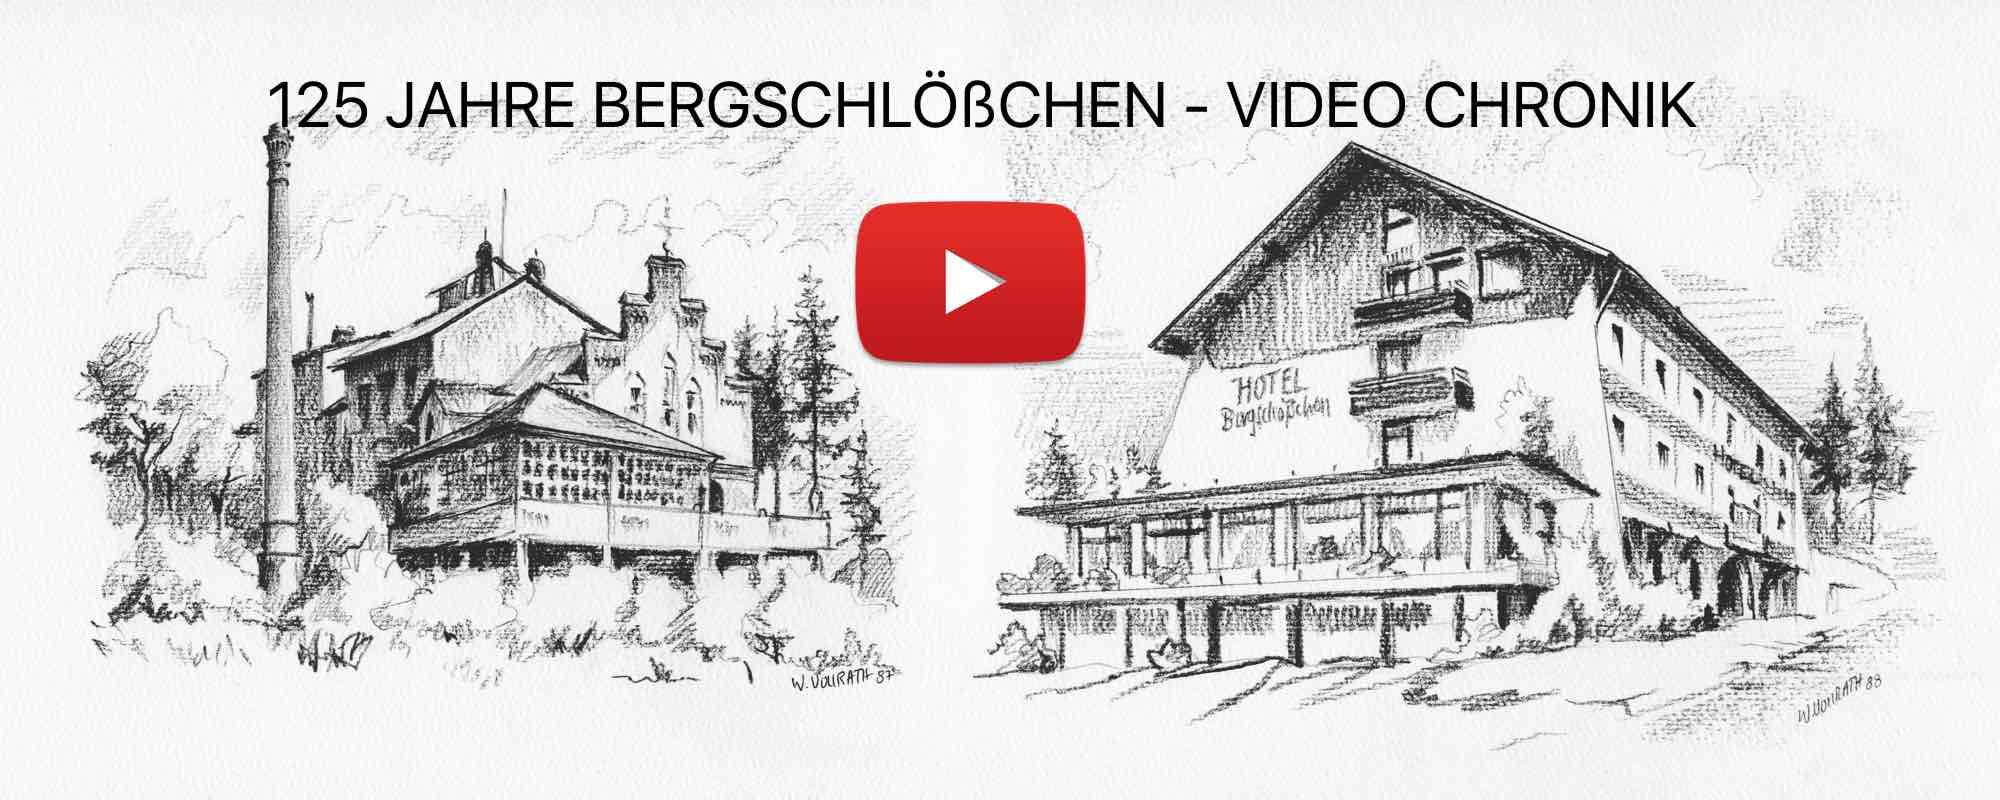 125 Jahr Bergschlößchen - Video Chronik ansehen